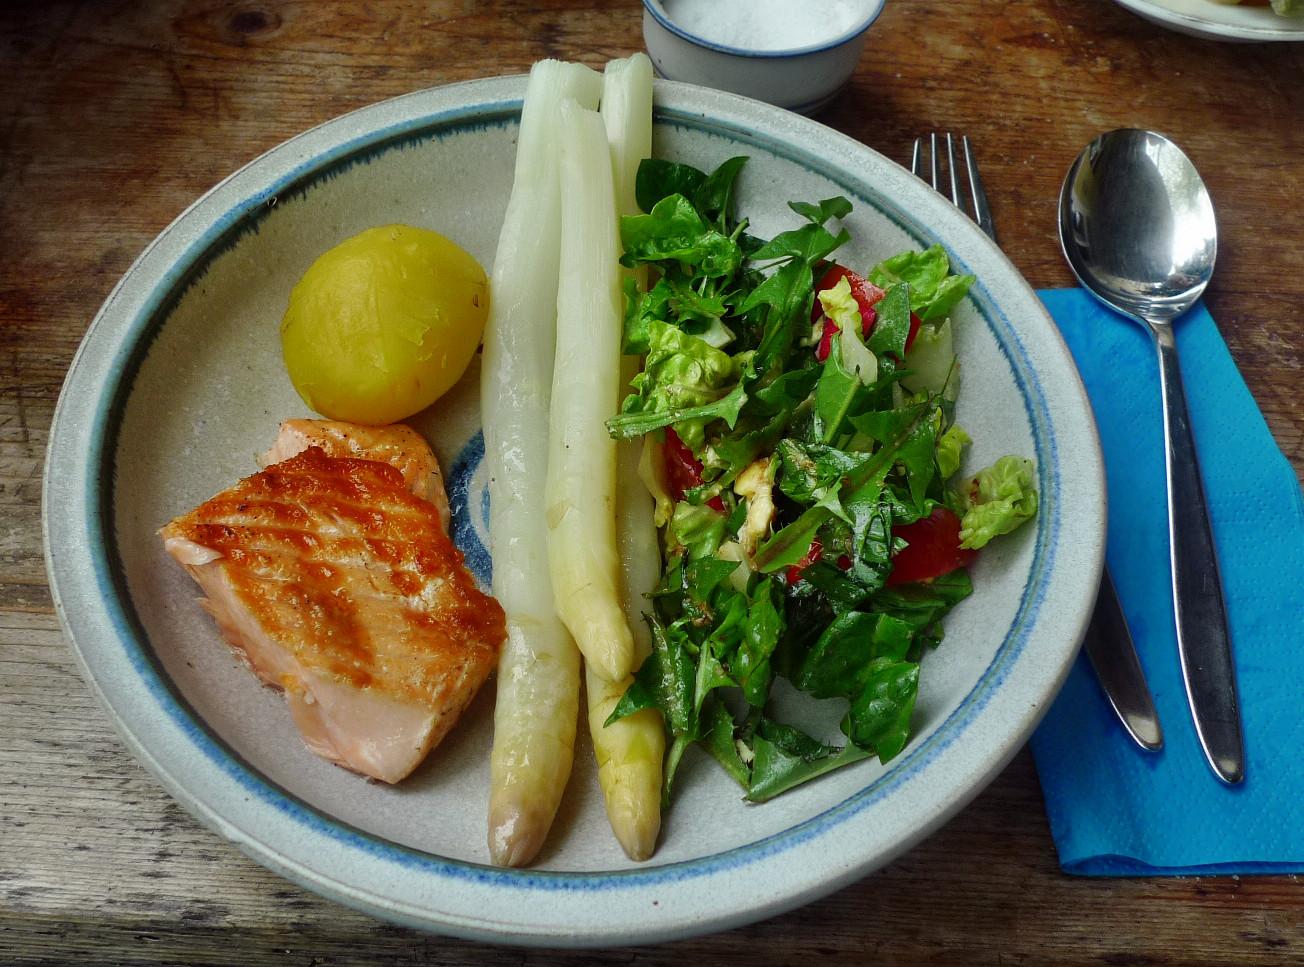 Lachs,Spargel,Salat,Kartoffeln - 25.4.15   (11)